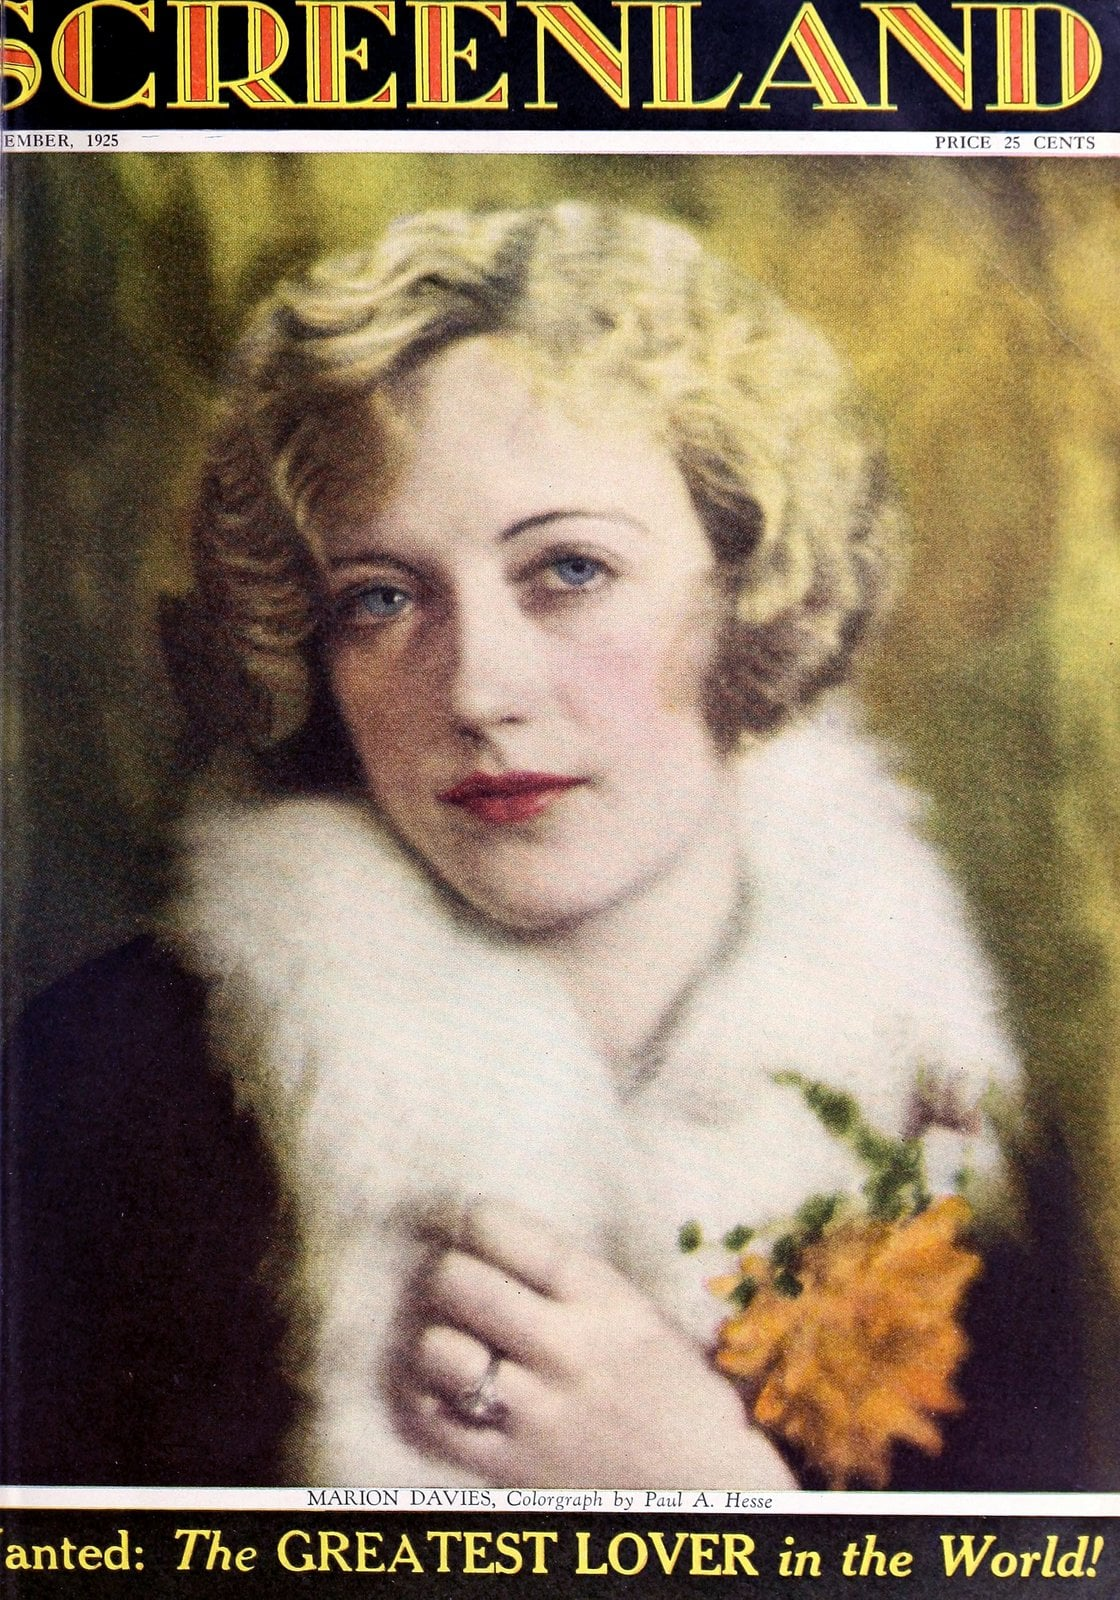 Vintage actress Marion Davies (1925)